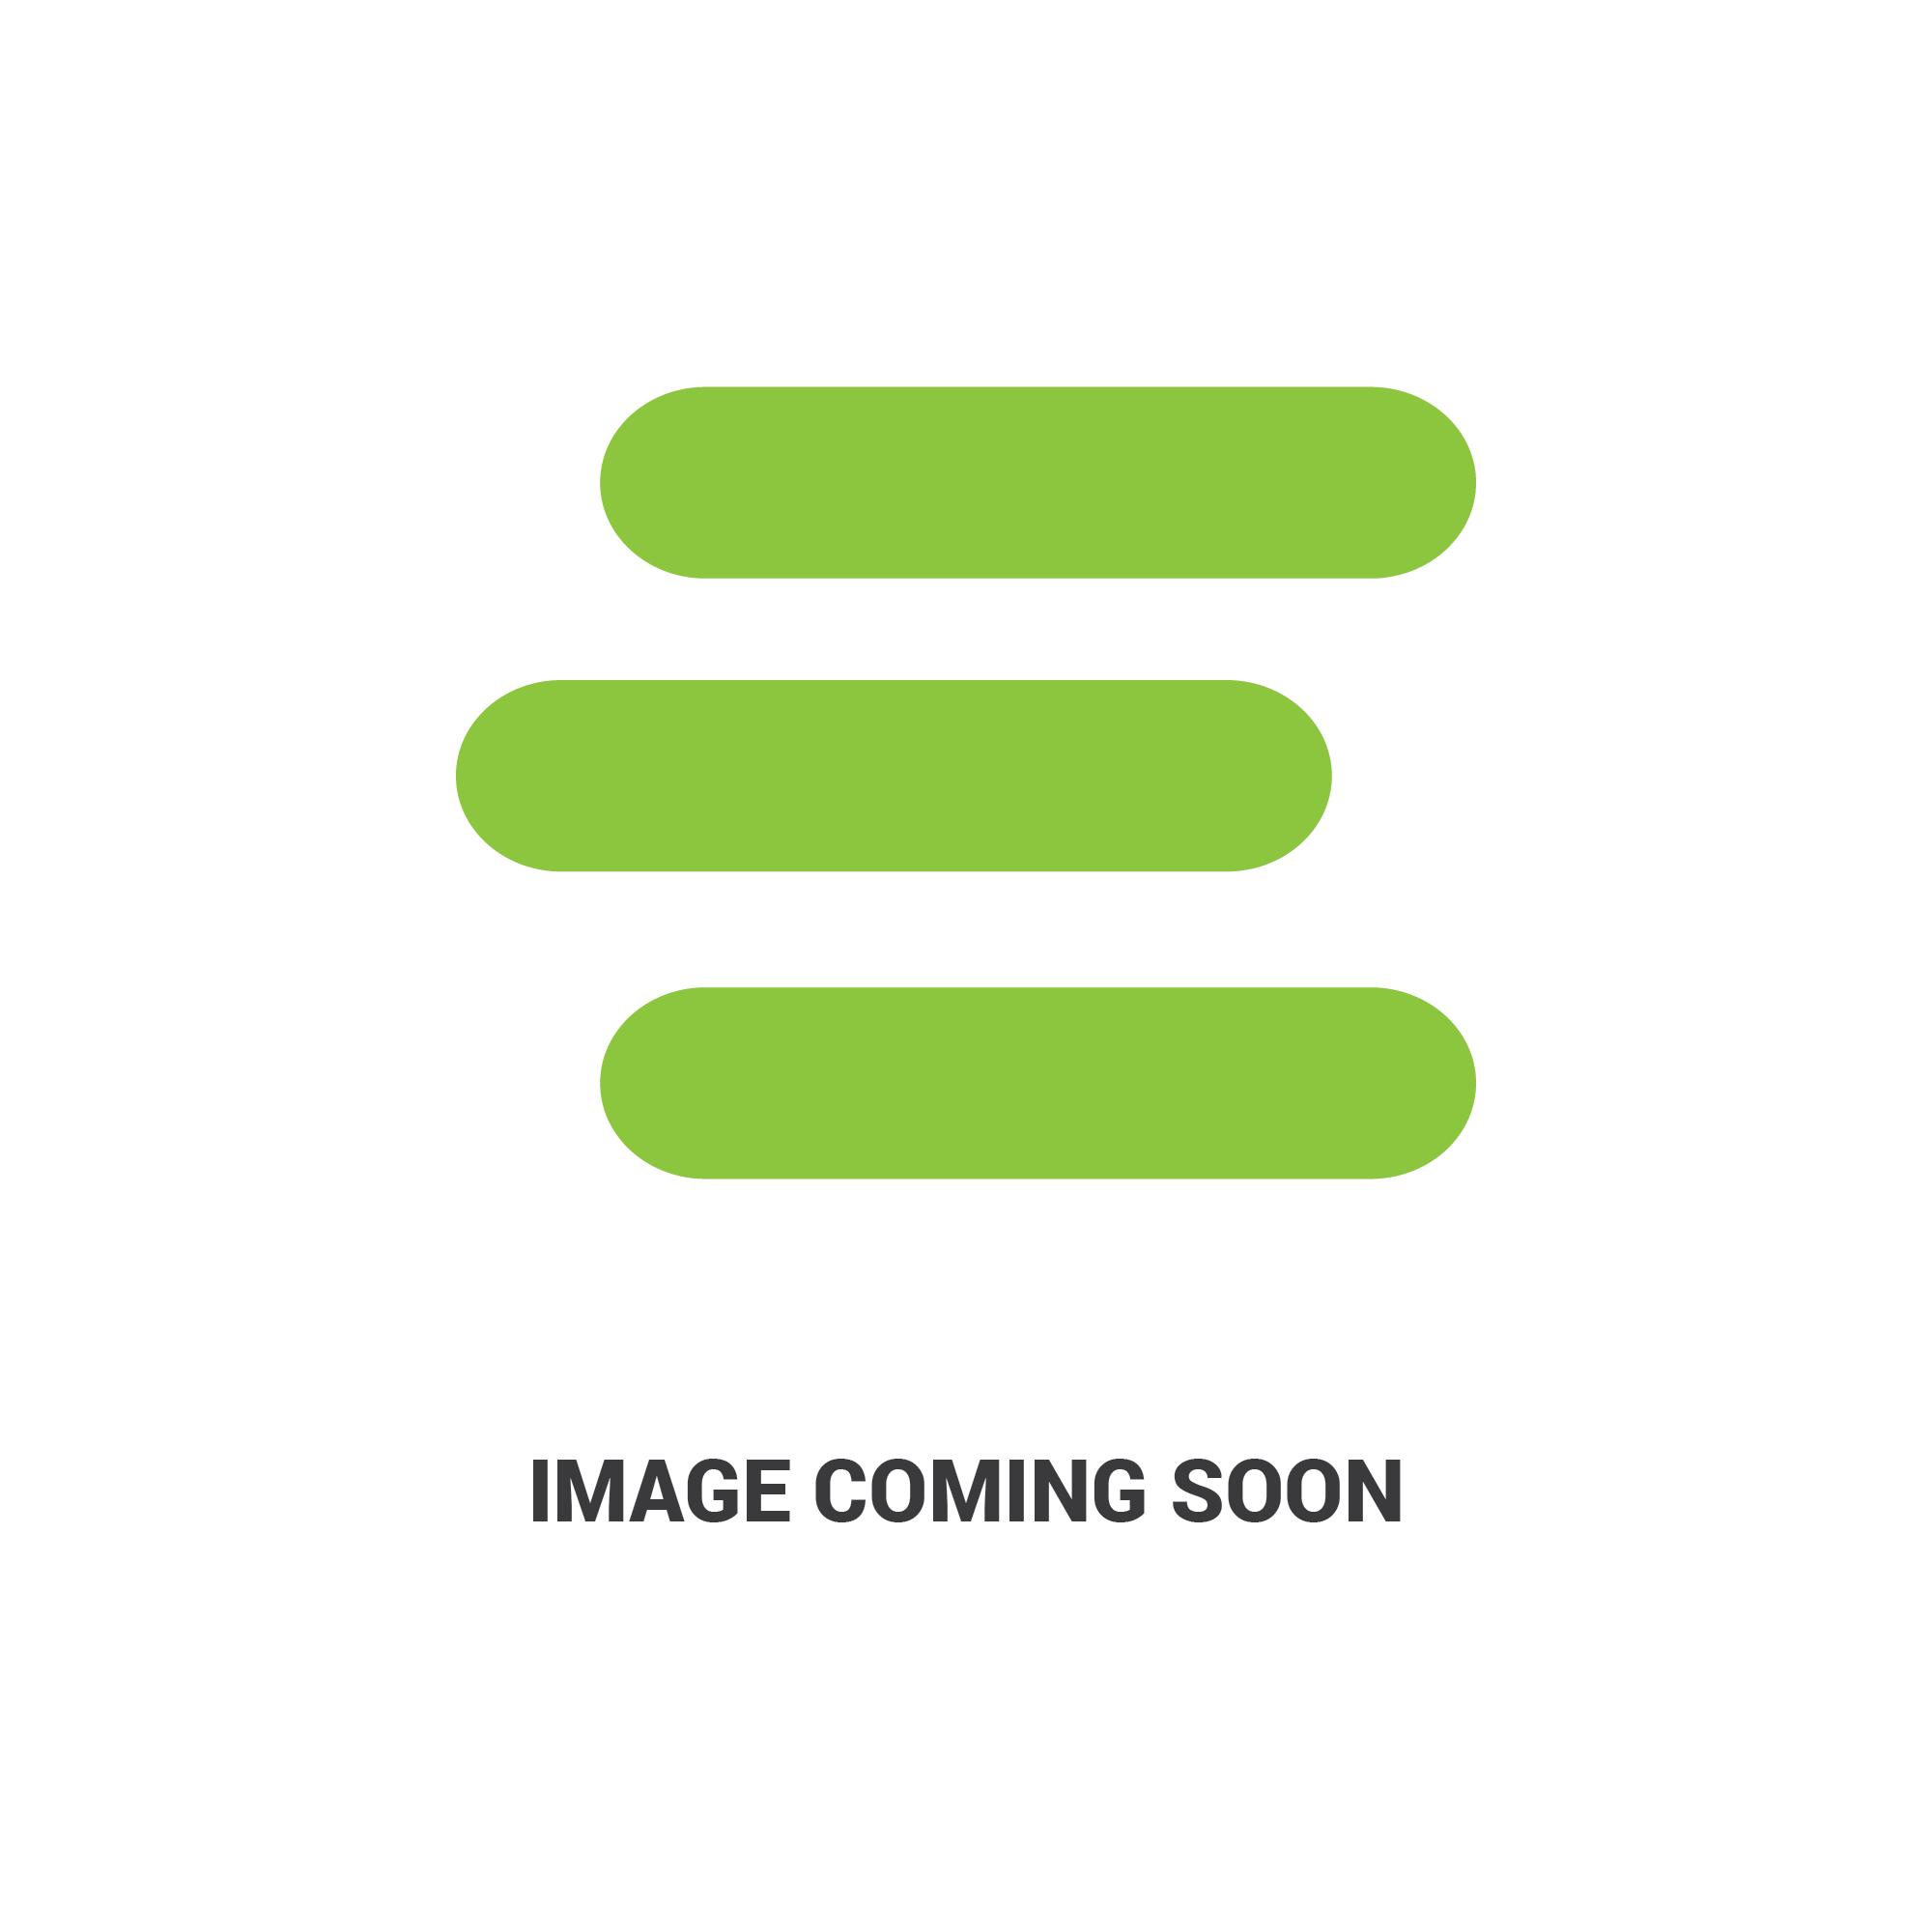 E-6C040-554401857_2.jpg